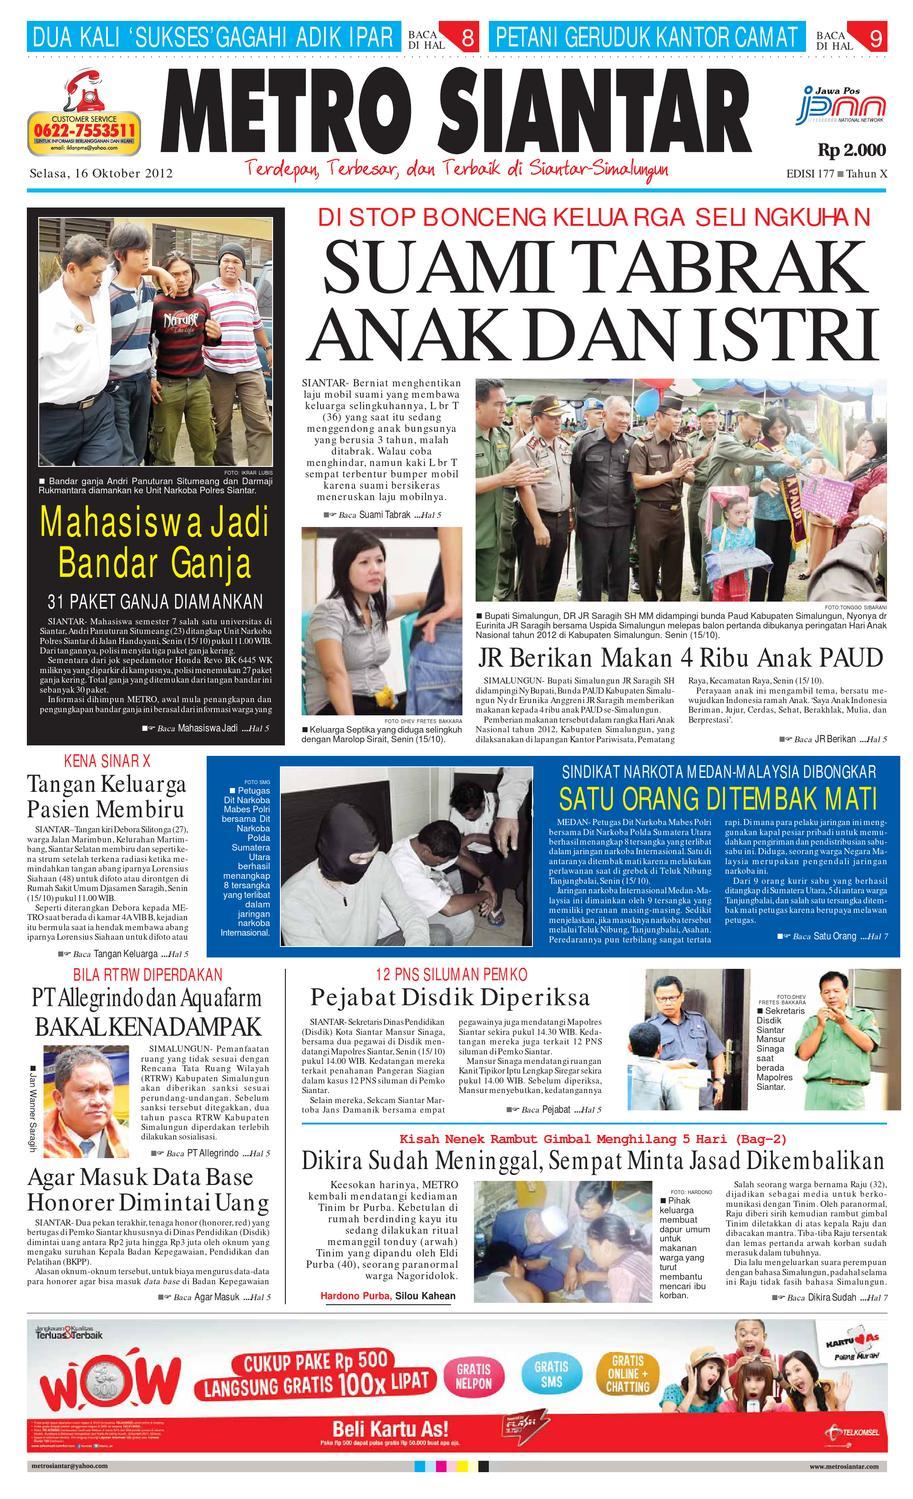 Epaper Metro Siantar By Issuu Produk Ukm Bumn Teh Hijau Celup Cap Botol 25 Tea Bags Aroma Melati Jumashop Free Ongkir Depok Ampamp Jakarta